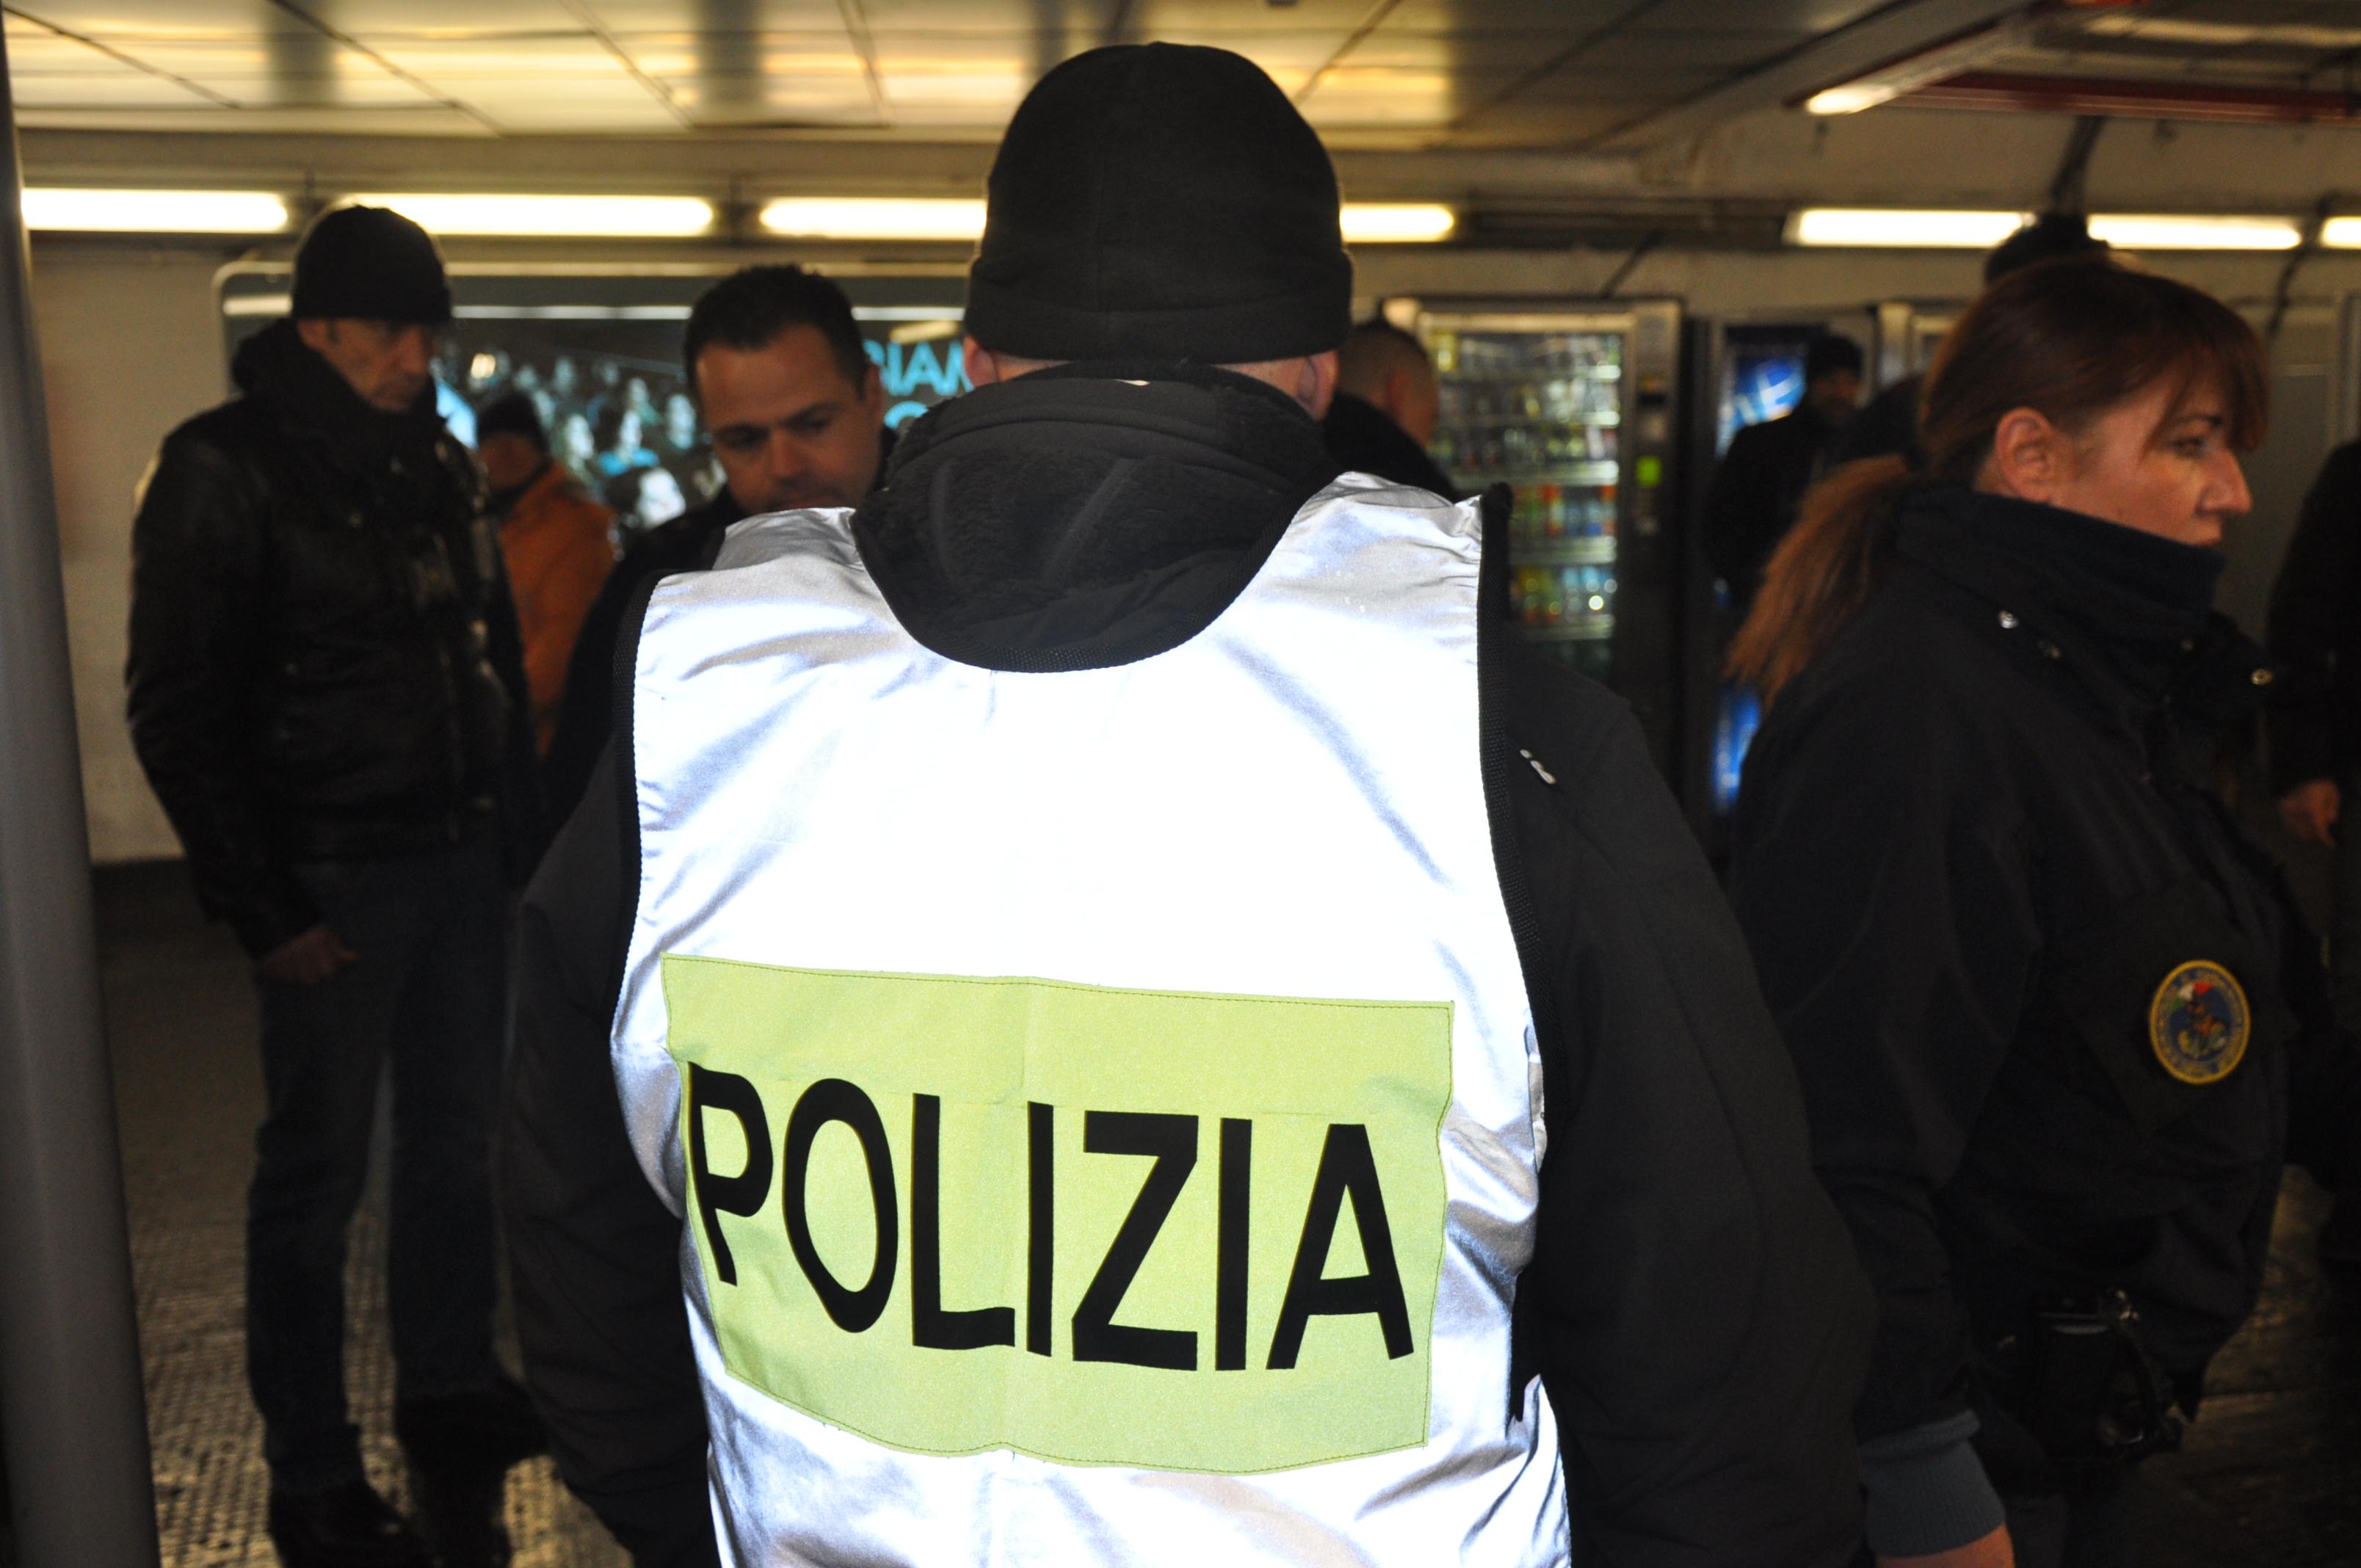 Ufficio Passaporti Genova Nervi : Questure poliziadistato it genova